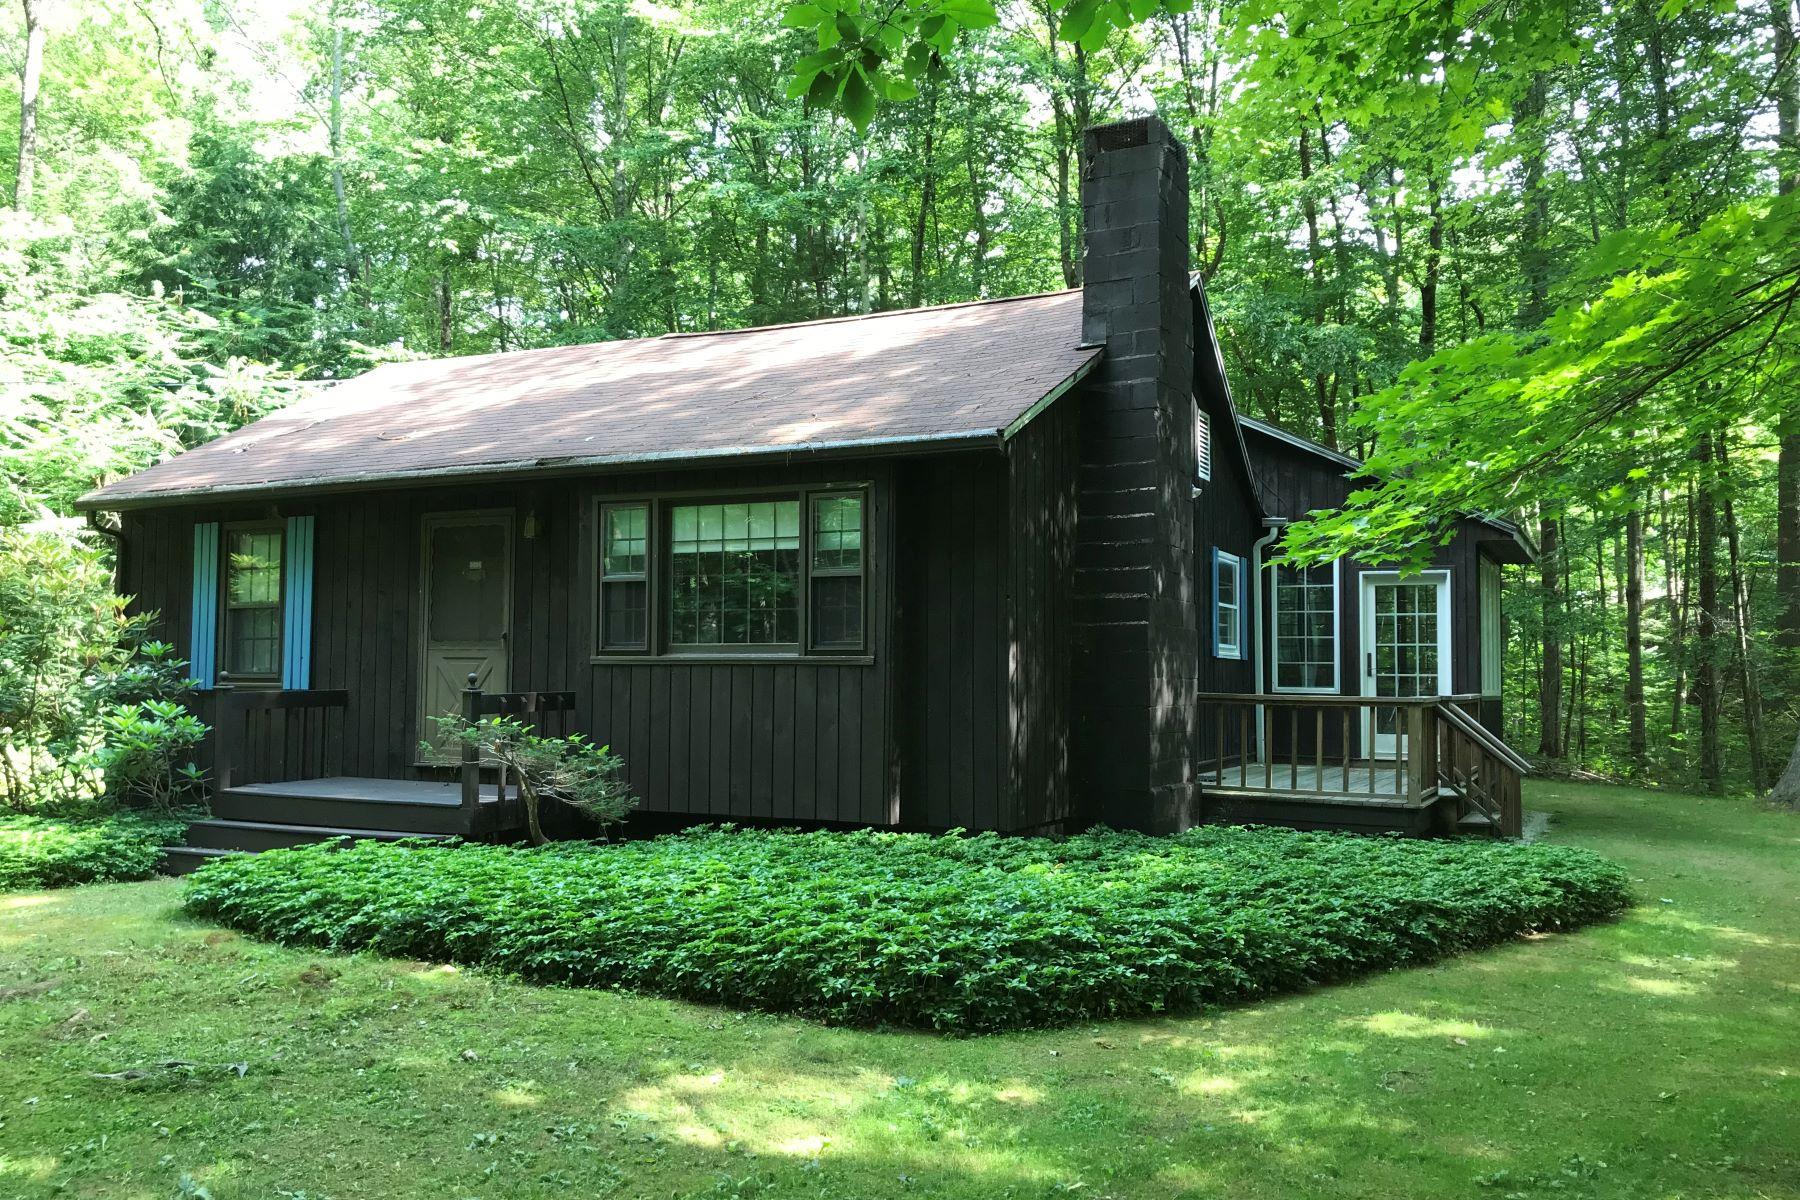 Casa Unifamiliar por un Venta en Cozy Country Cottage in Woodland Setting 41 Pine St New Marlborough, Massachusetts 01259 Estados Unidos